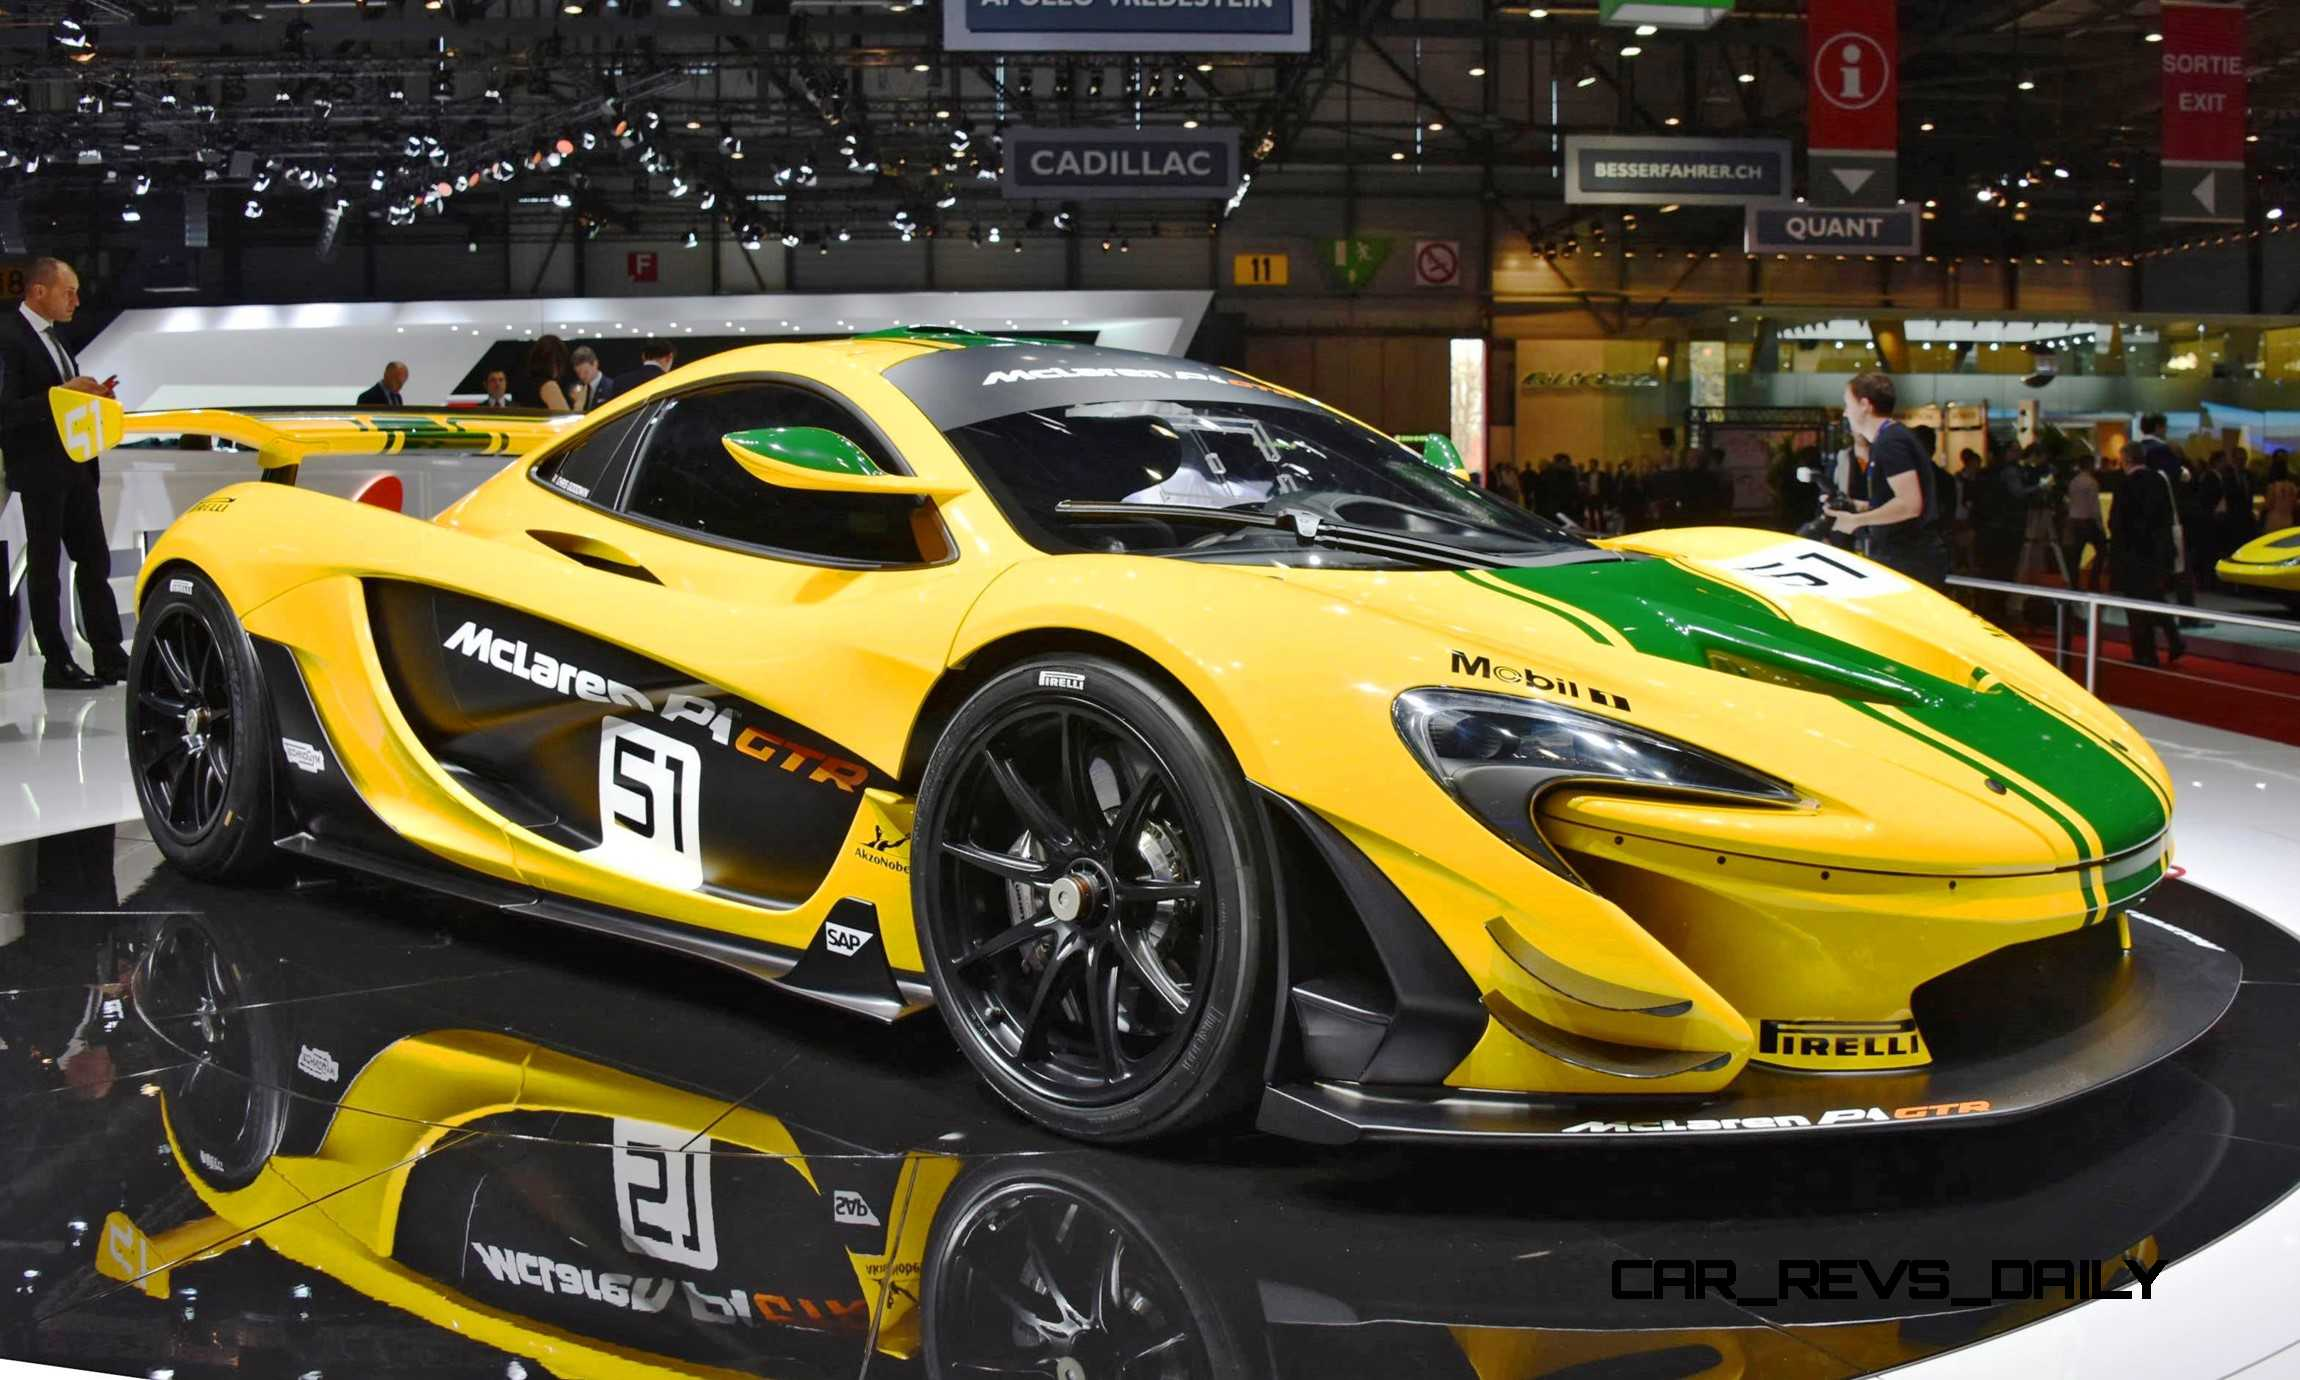 http://www.car-revs-daily.com/wp-content/uploads/2015/03/2016-McLaren-P1-GTR-Meets-1997-McLaren-F1-GT-LongTail-In-Geneva-7.jpg